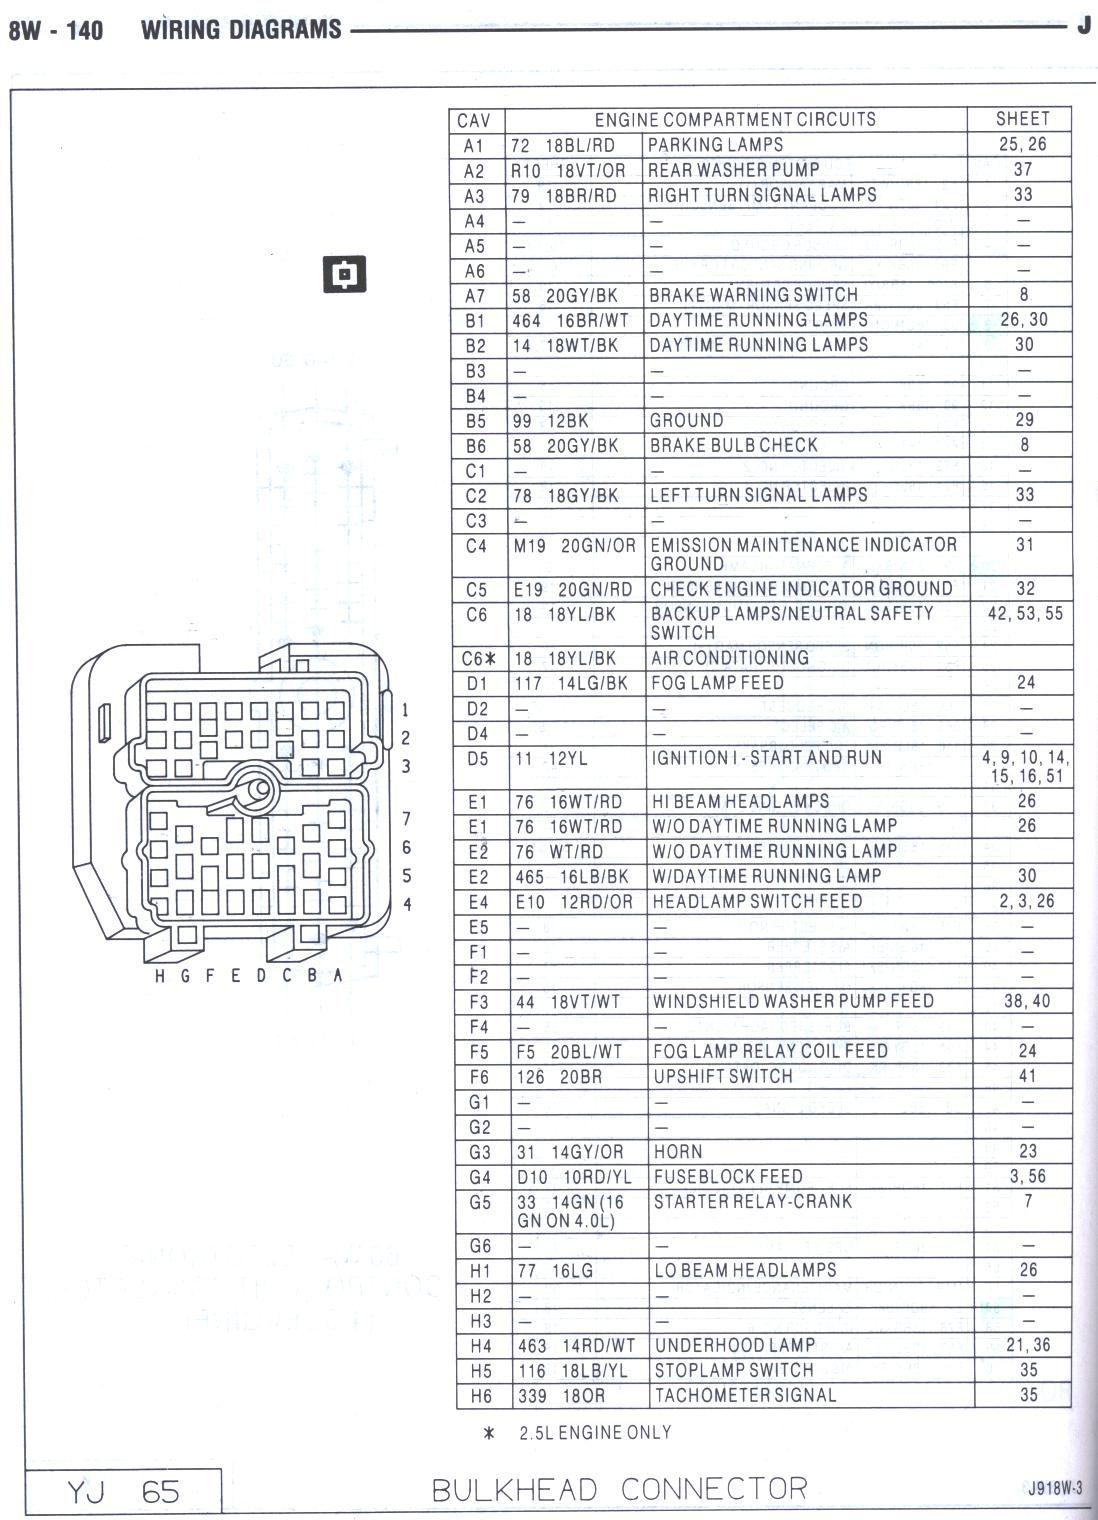 jeep yj wiring diagram yamaha mio soul electrical 87 bulkhead